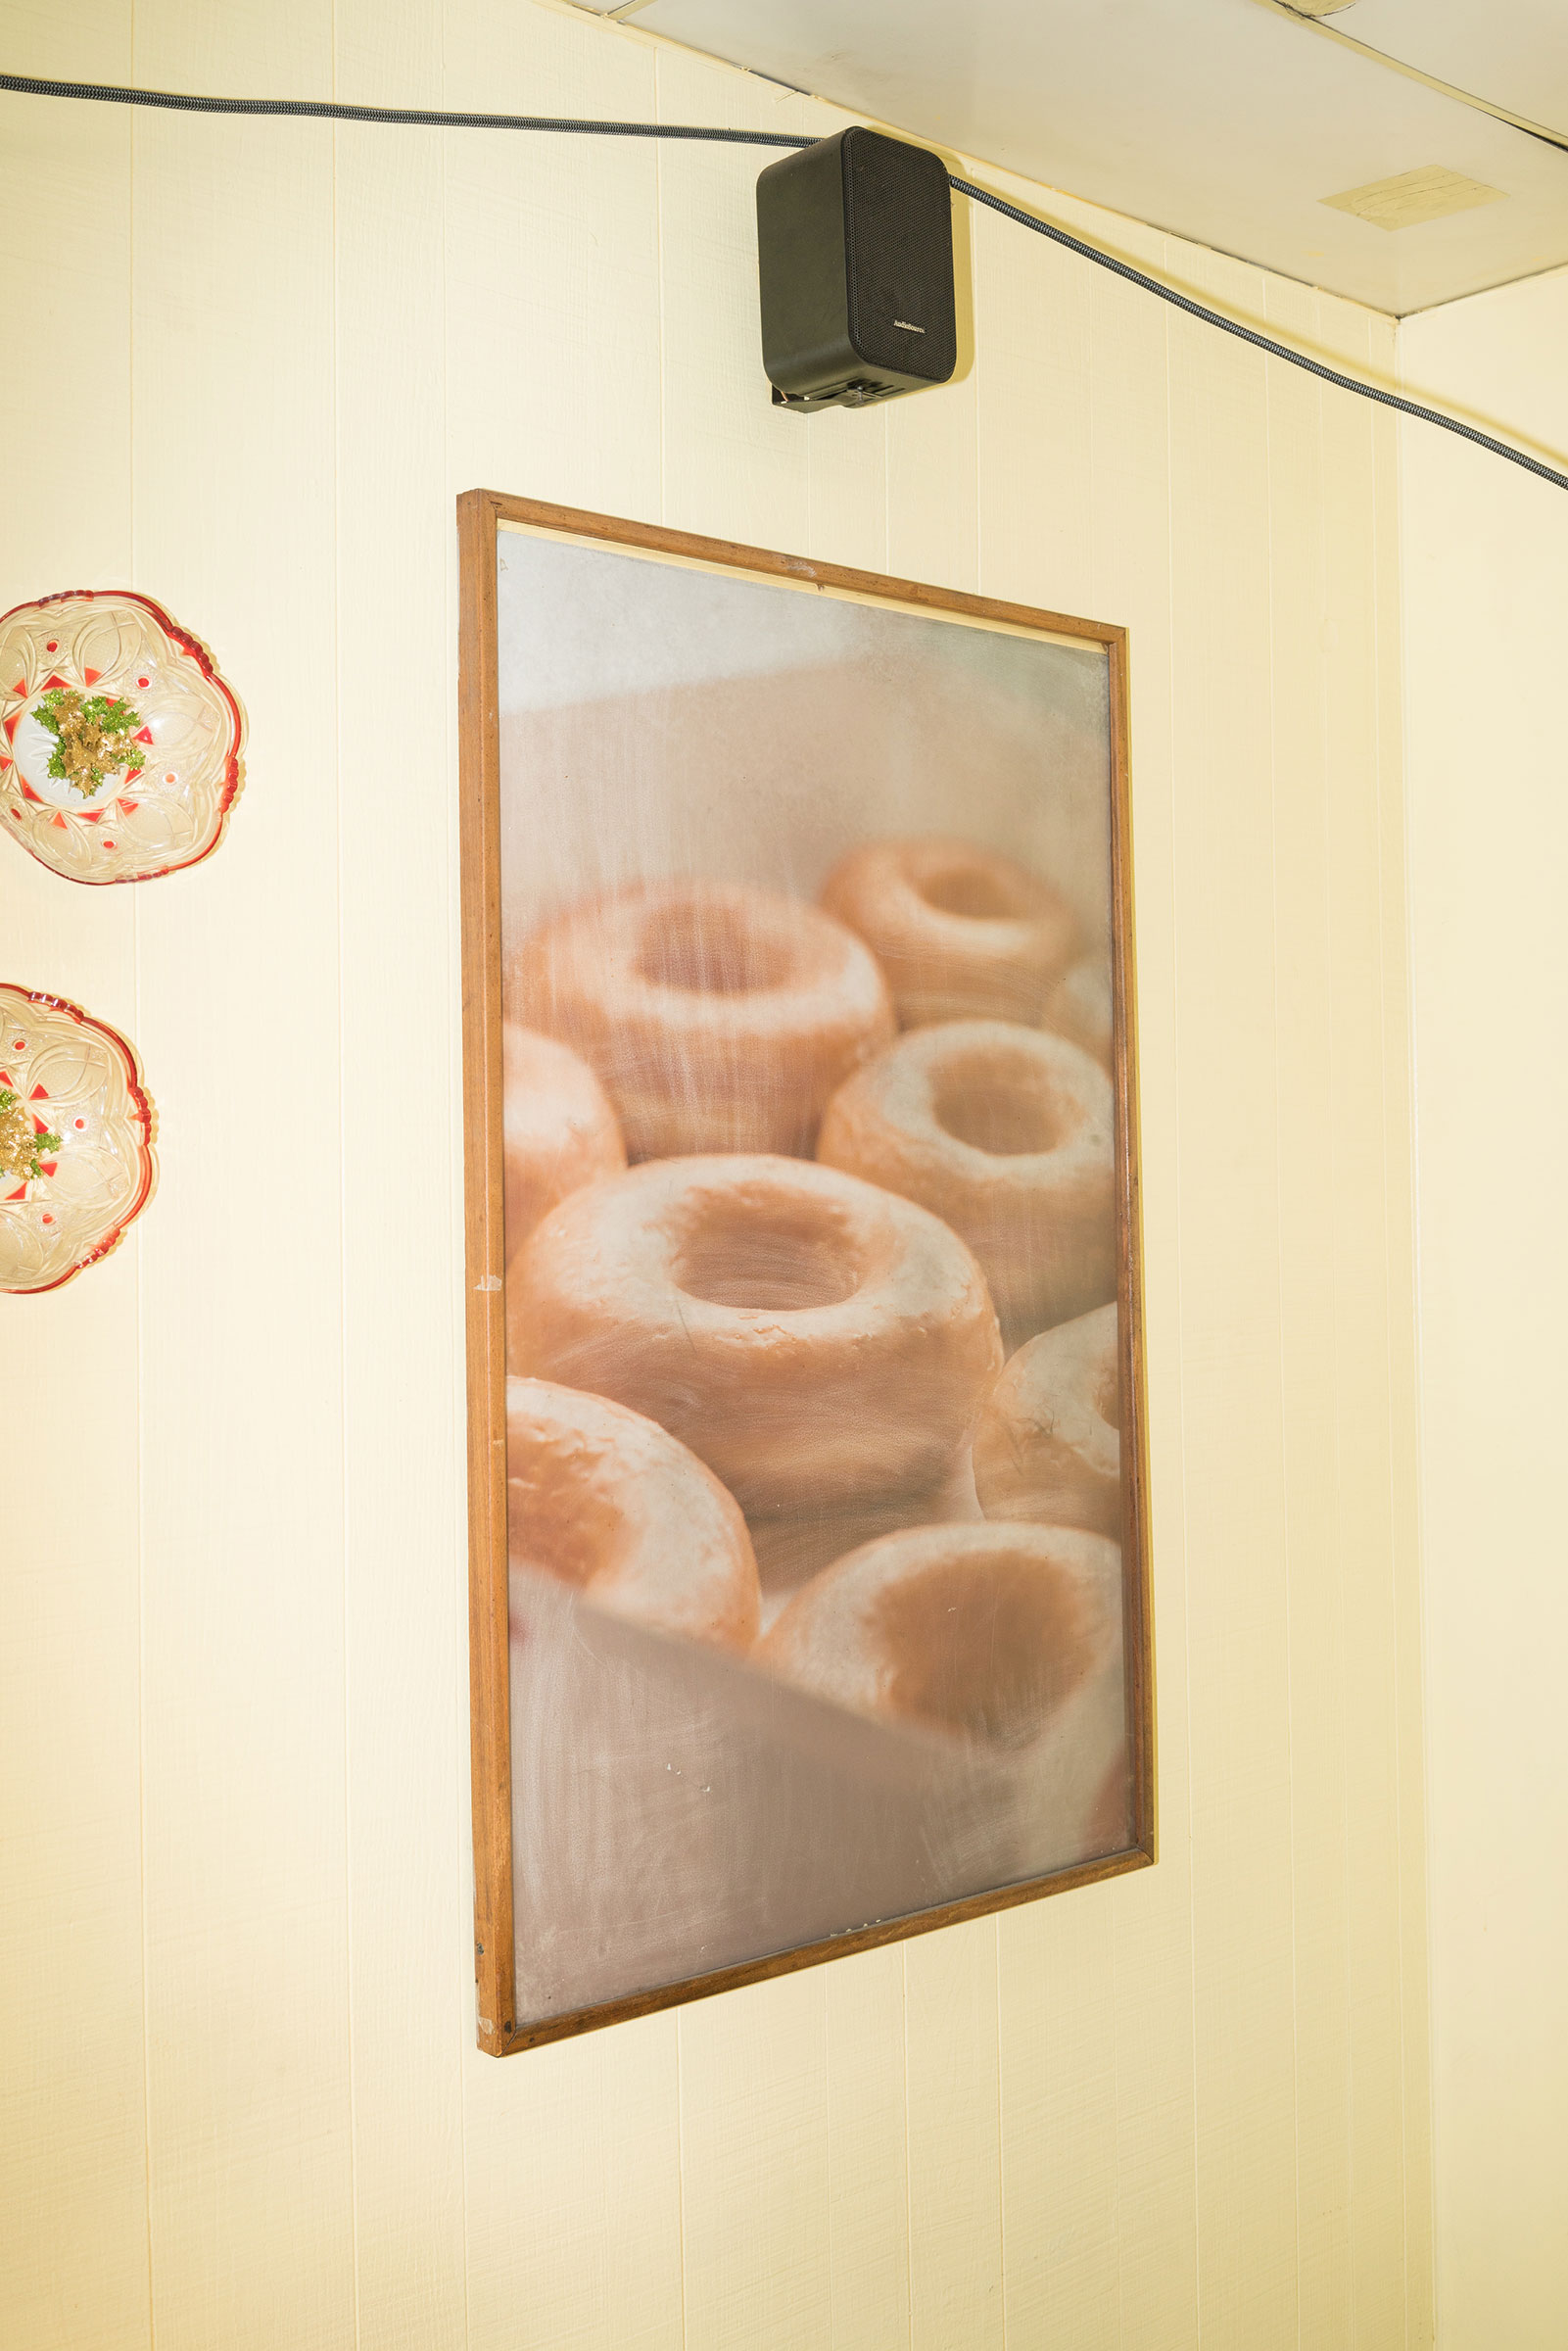 Michelle's Donuts on Santa Monica Boulevard